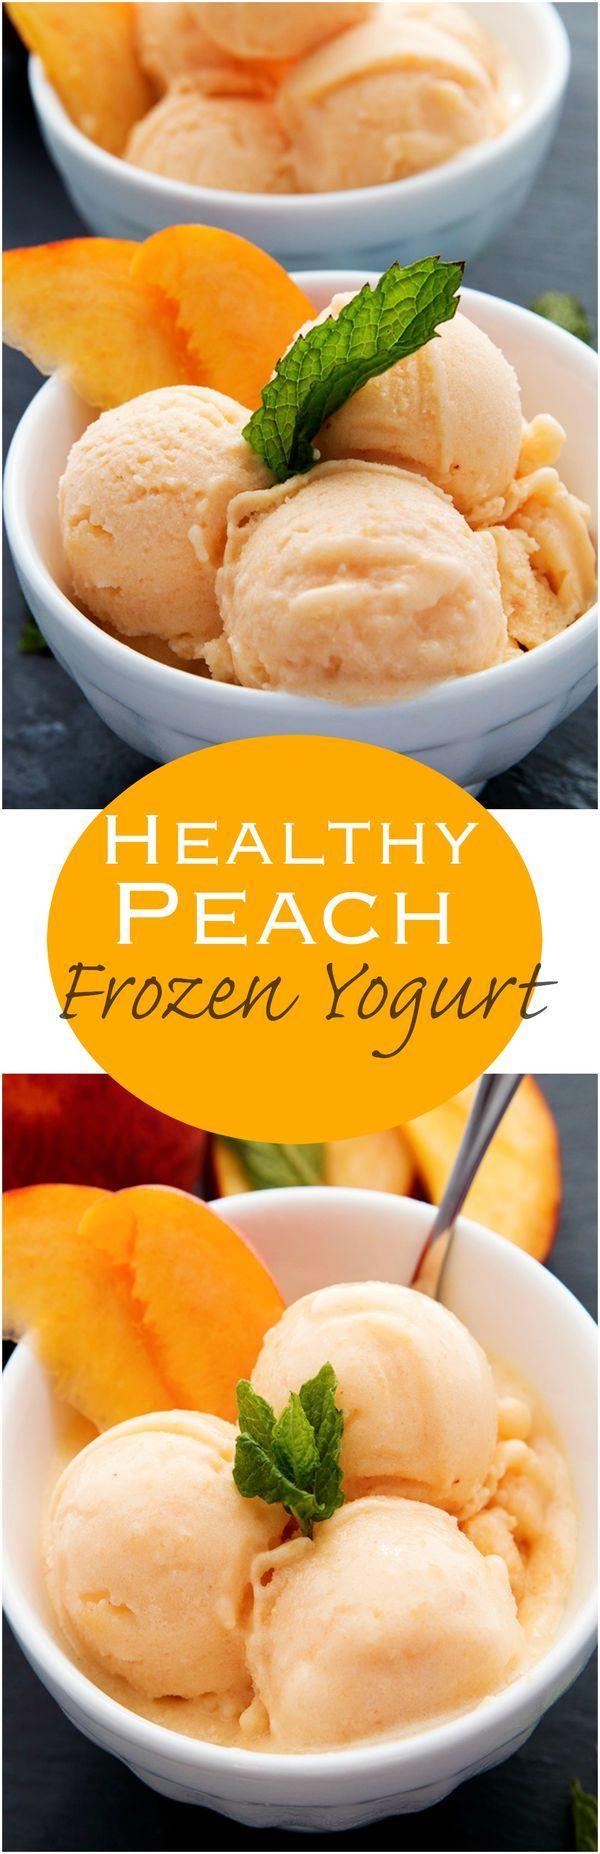 1 Mint, leaves. 1 (16-oz. bag Peaches, frozen. 4 tbsp Agave nectar or honey. 1 tbsp Lemon juice, fresh. 1/2 cup Yogurt, plain non-fat or whole.